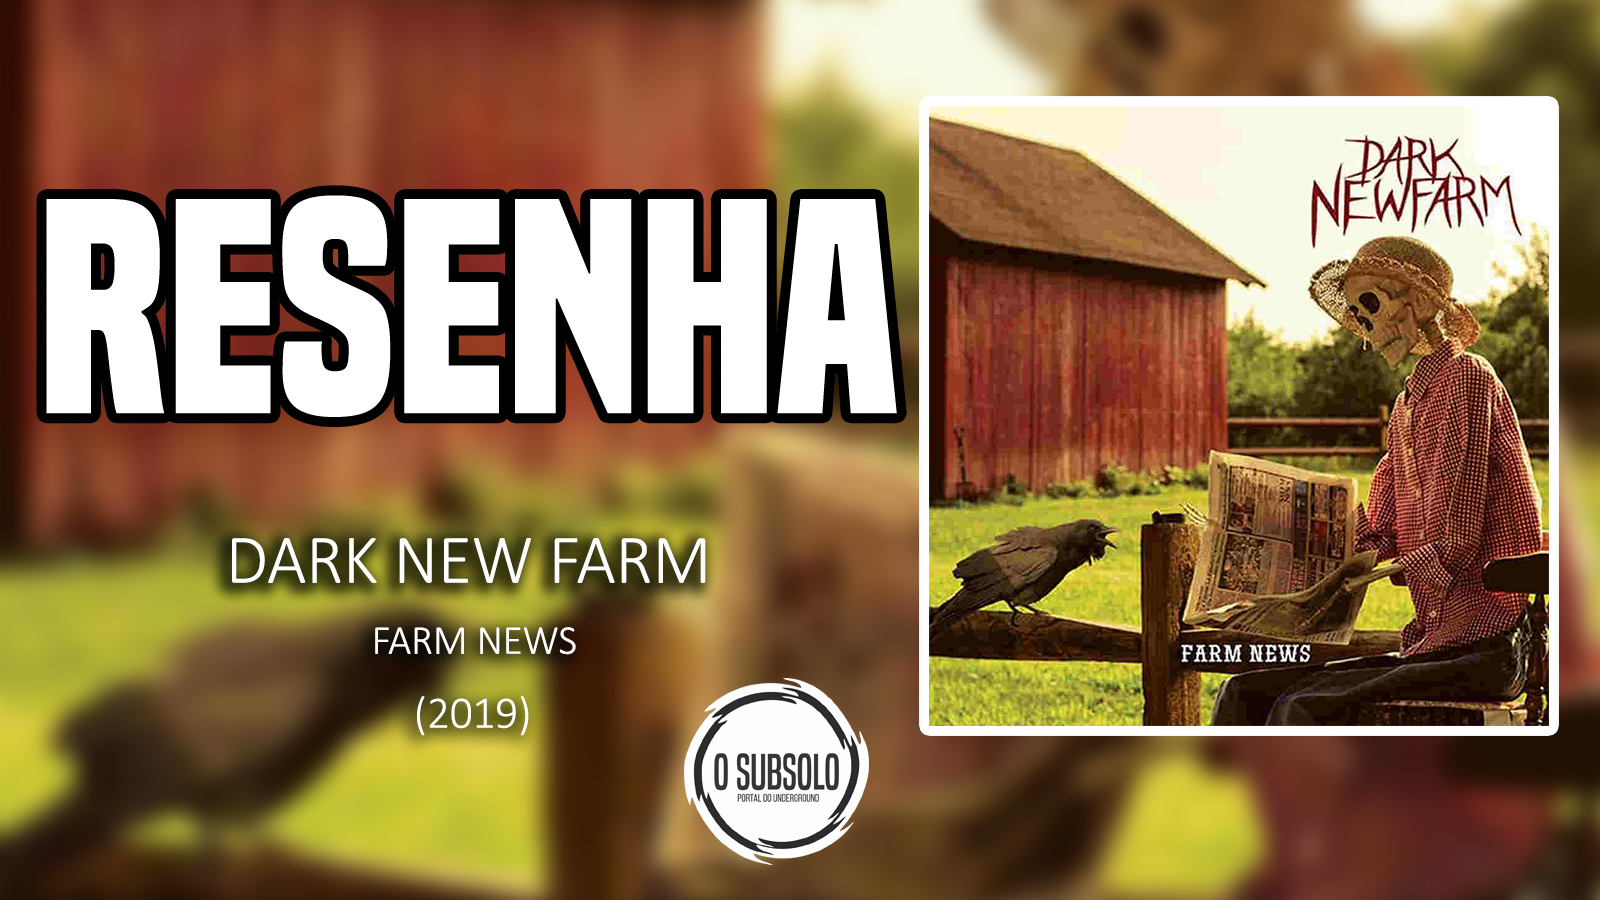 RESENHA | DARK NEW FARM | FARM NEWS 2019